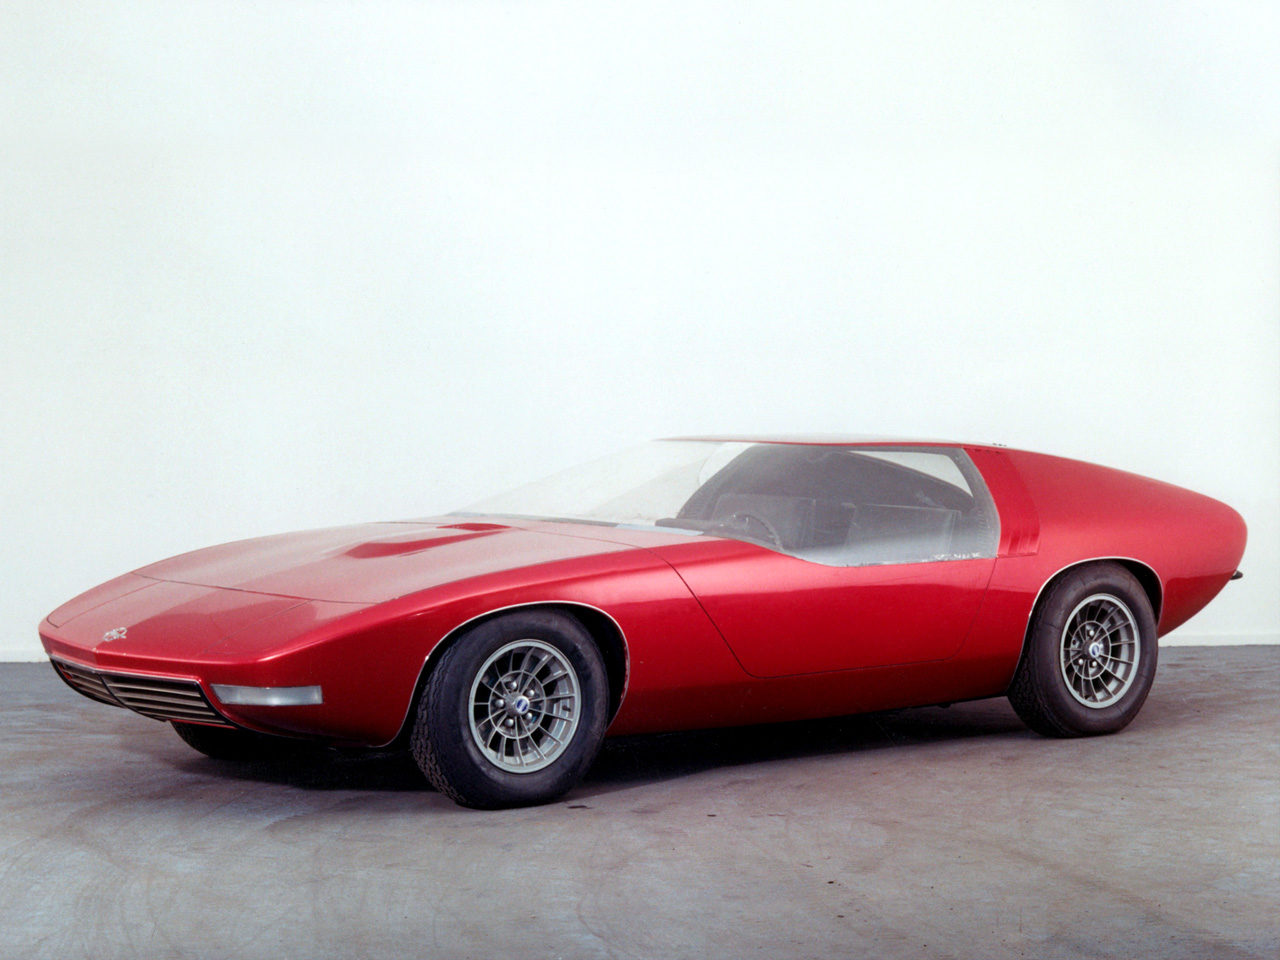 Opel CD Concept, 1969